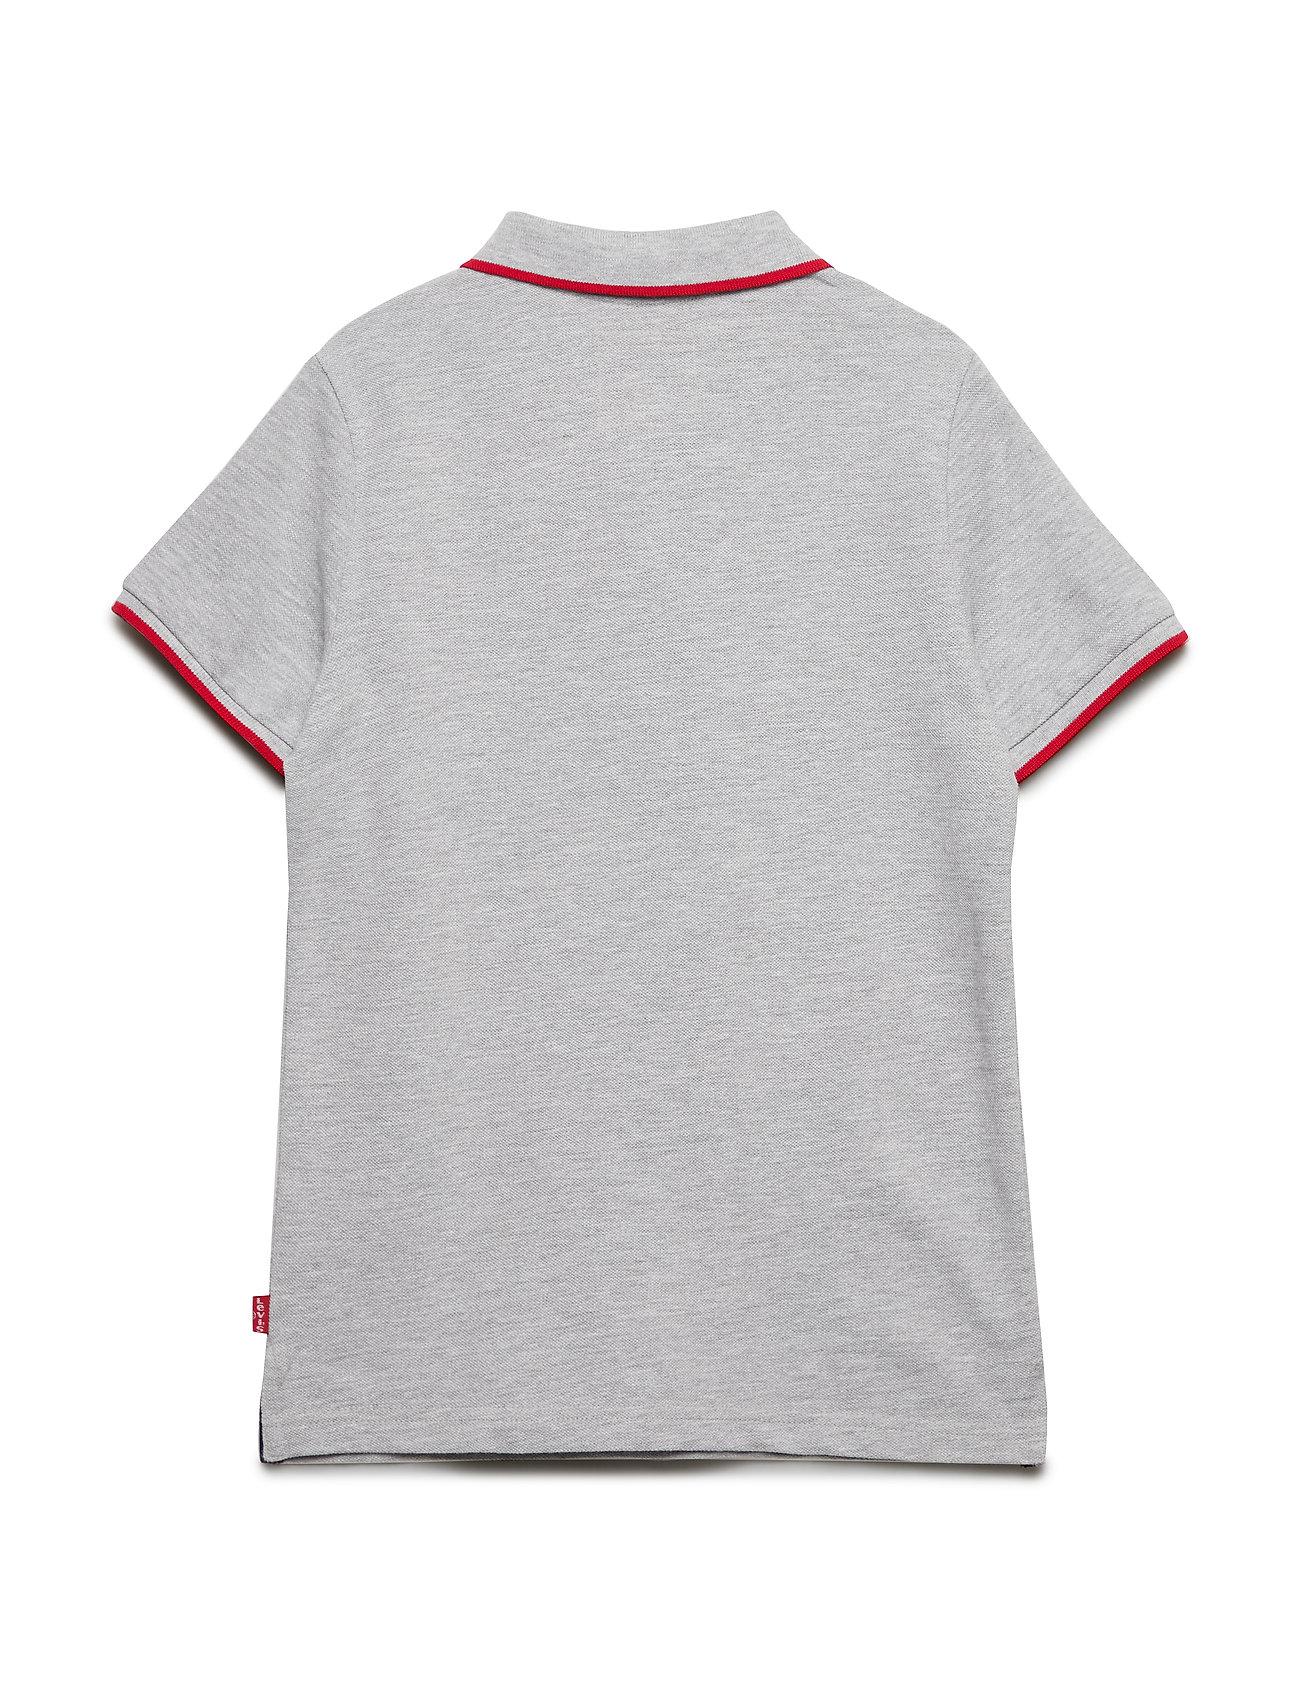 newest e6cc9 aa826 Levi-s ALE T-paidat netistä   Nyt jopa -60%   SPOT-A-SHOP